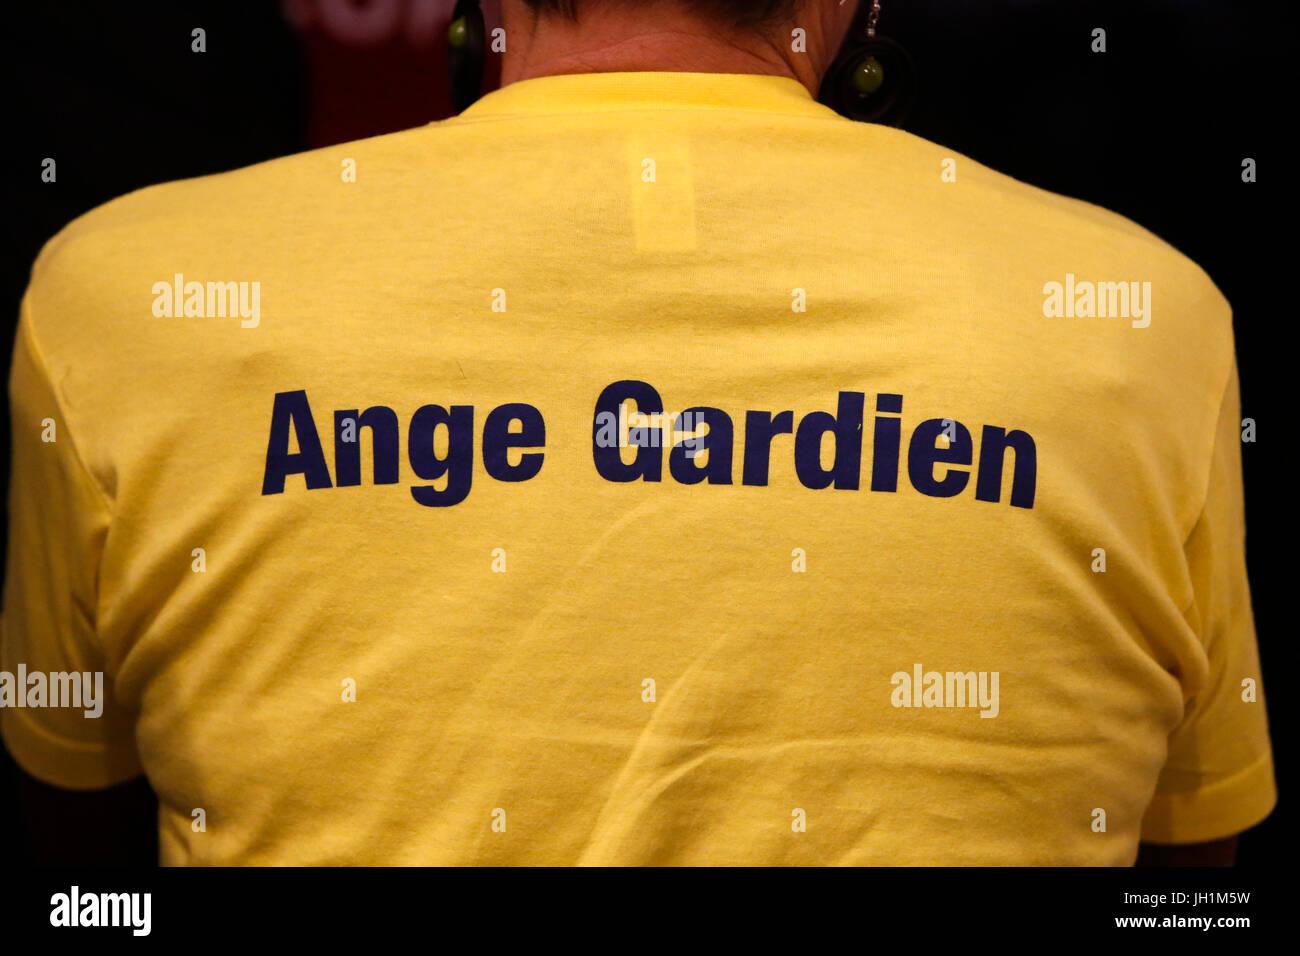 Hopeteen festival, Issy-les-Moulineaux, France. Gardian angel t-shirt. - Stock Image